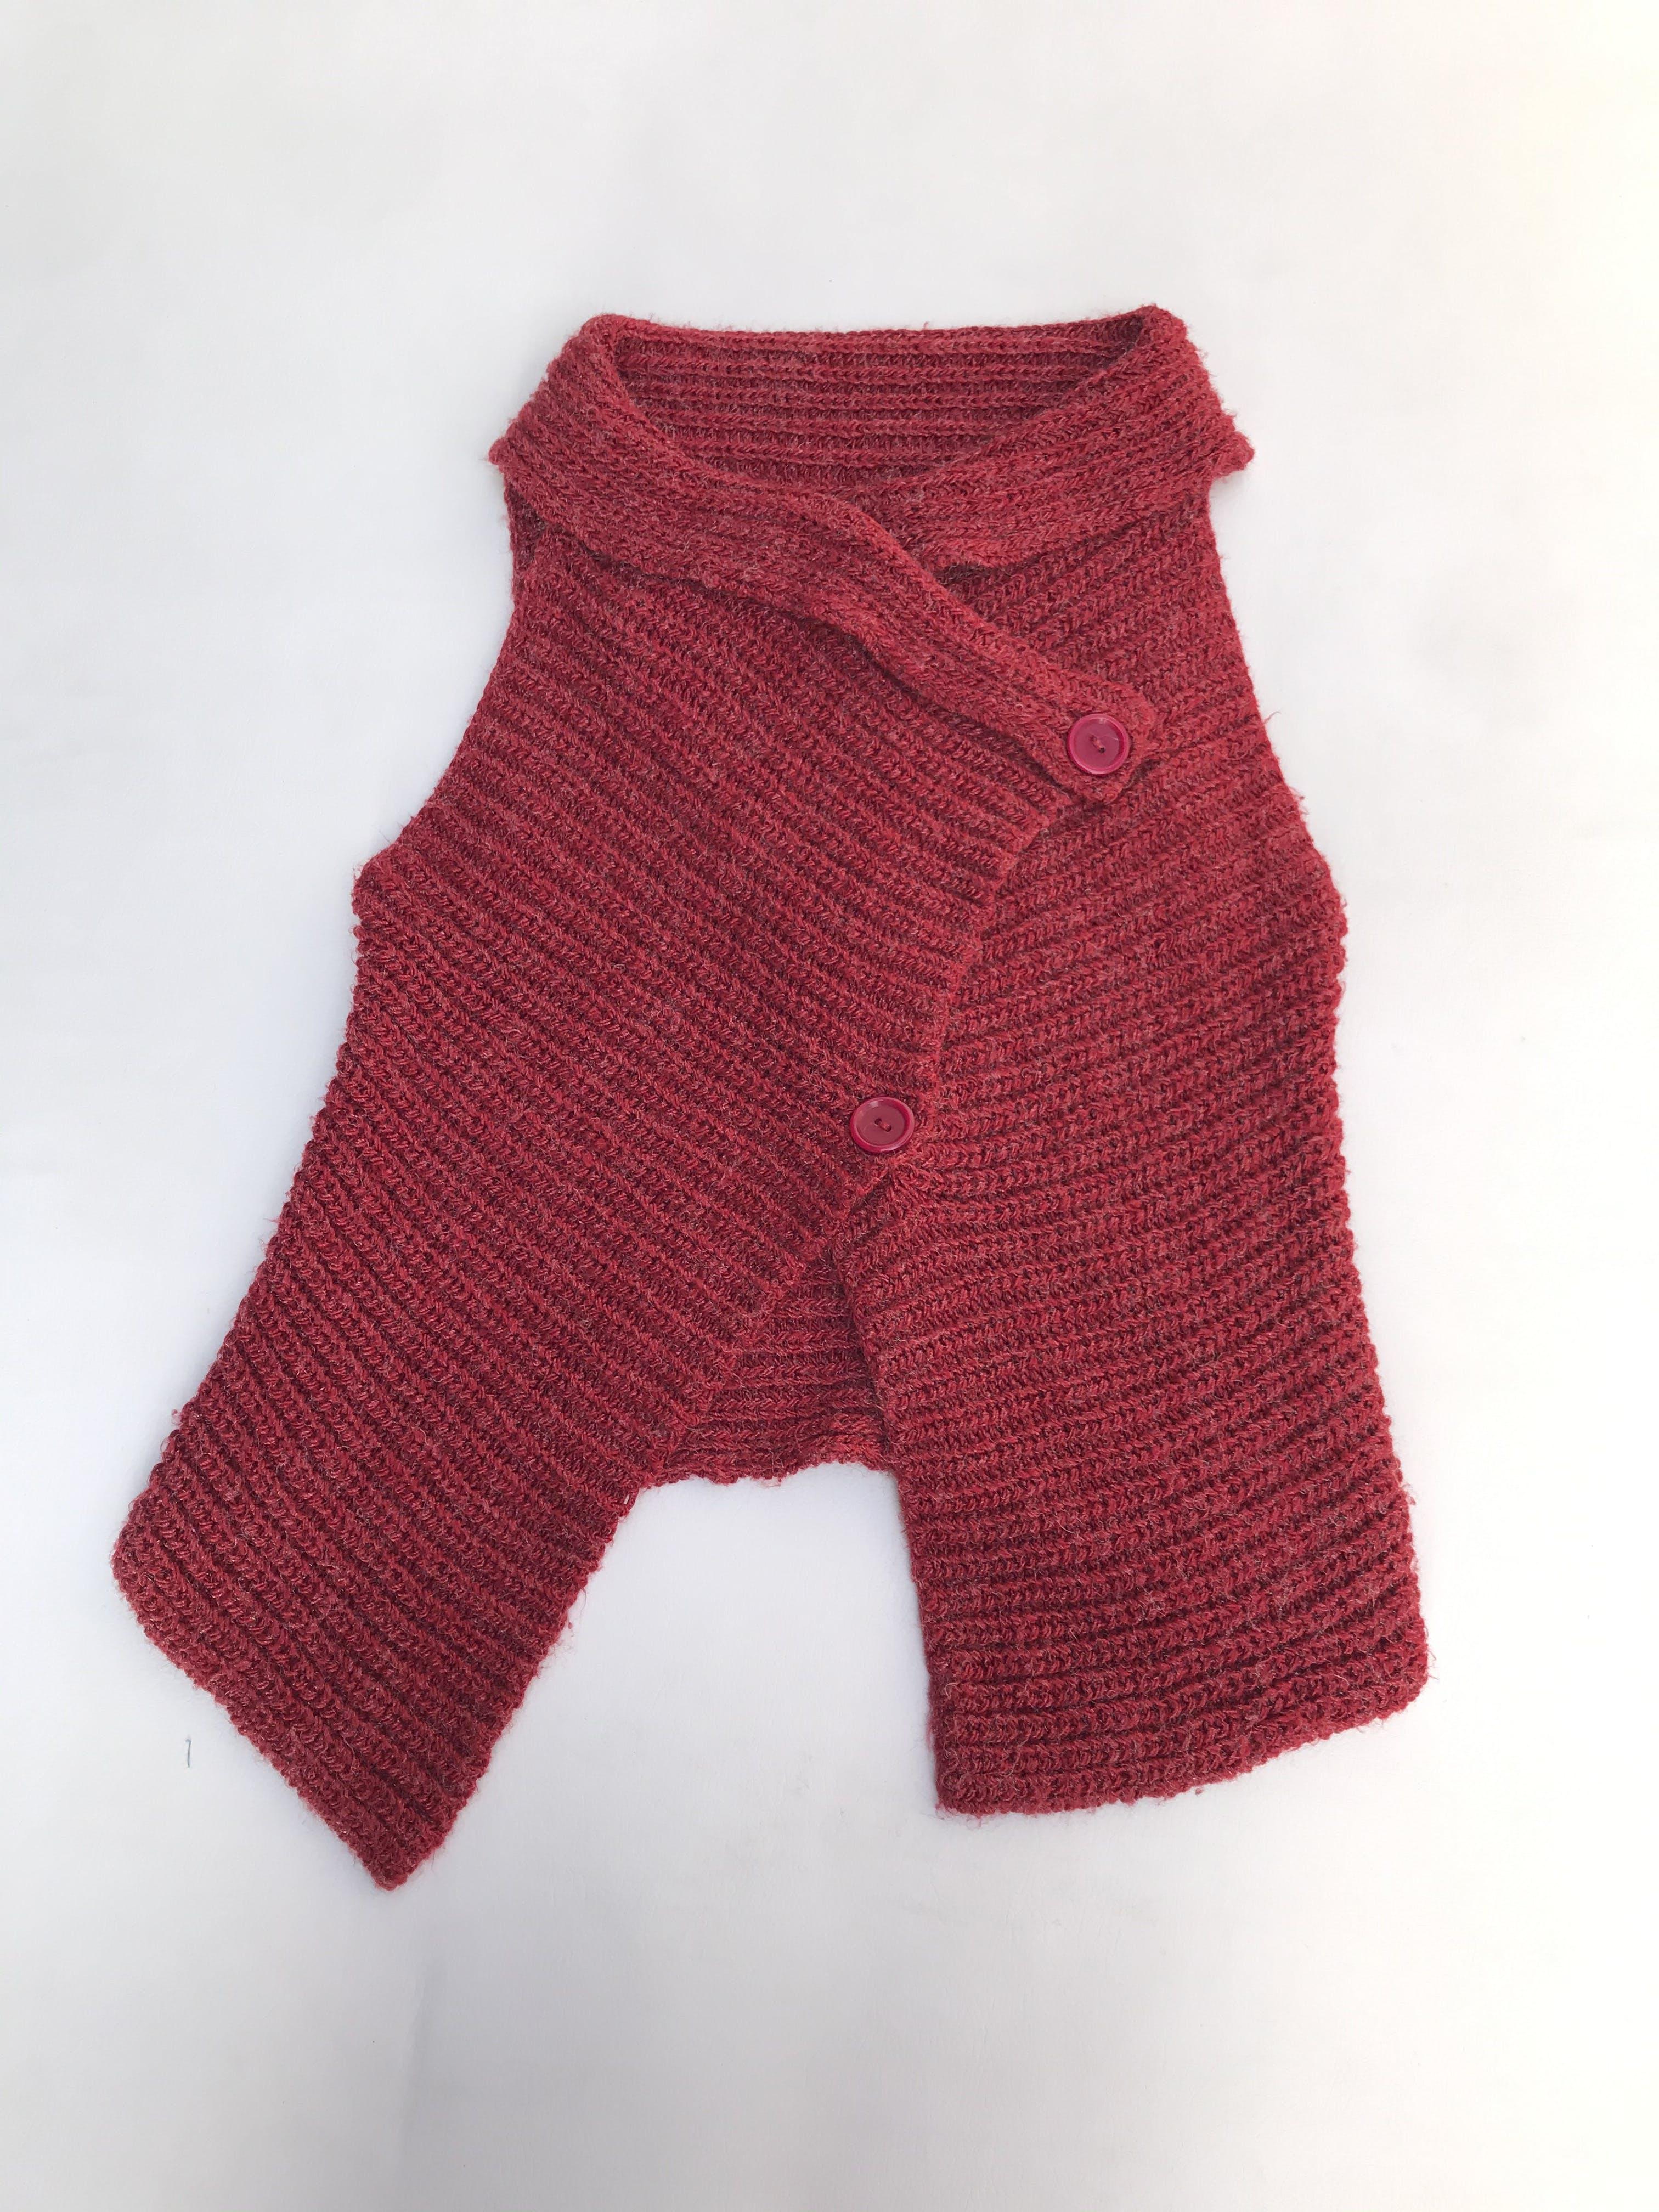 Chaleco tejido cerrado, rojo modelo cruzado con botones